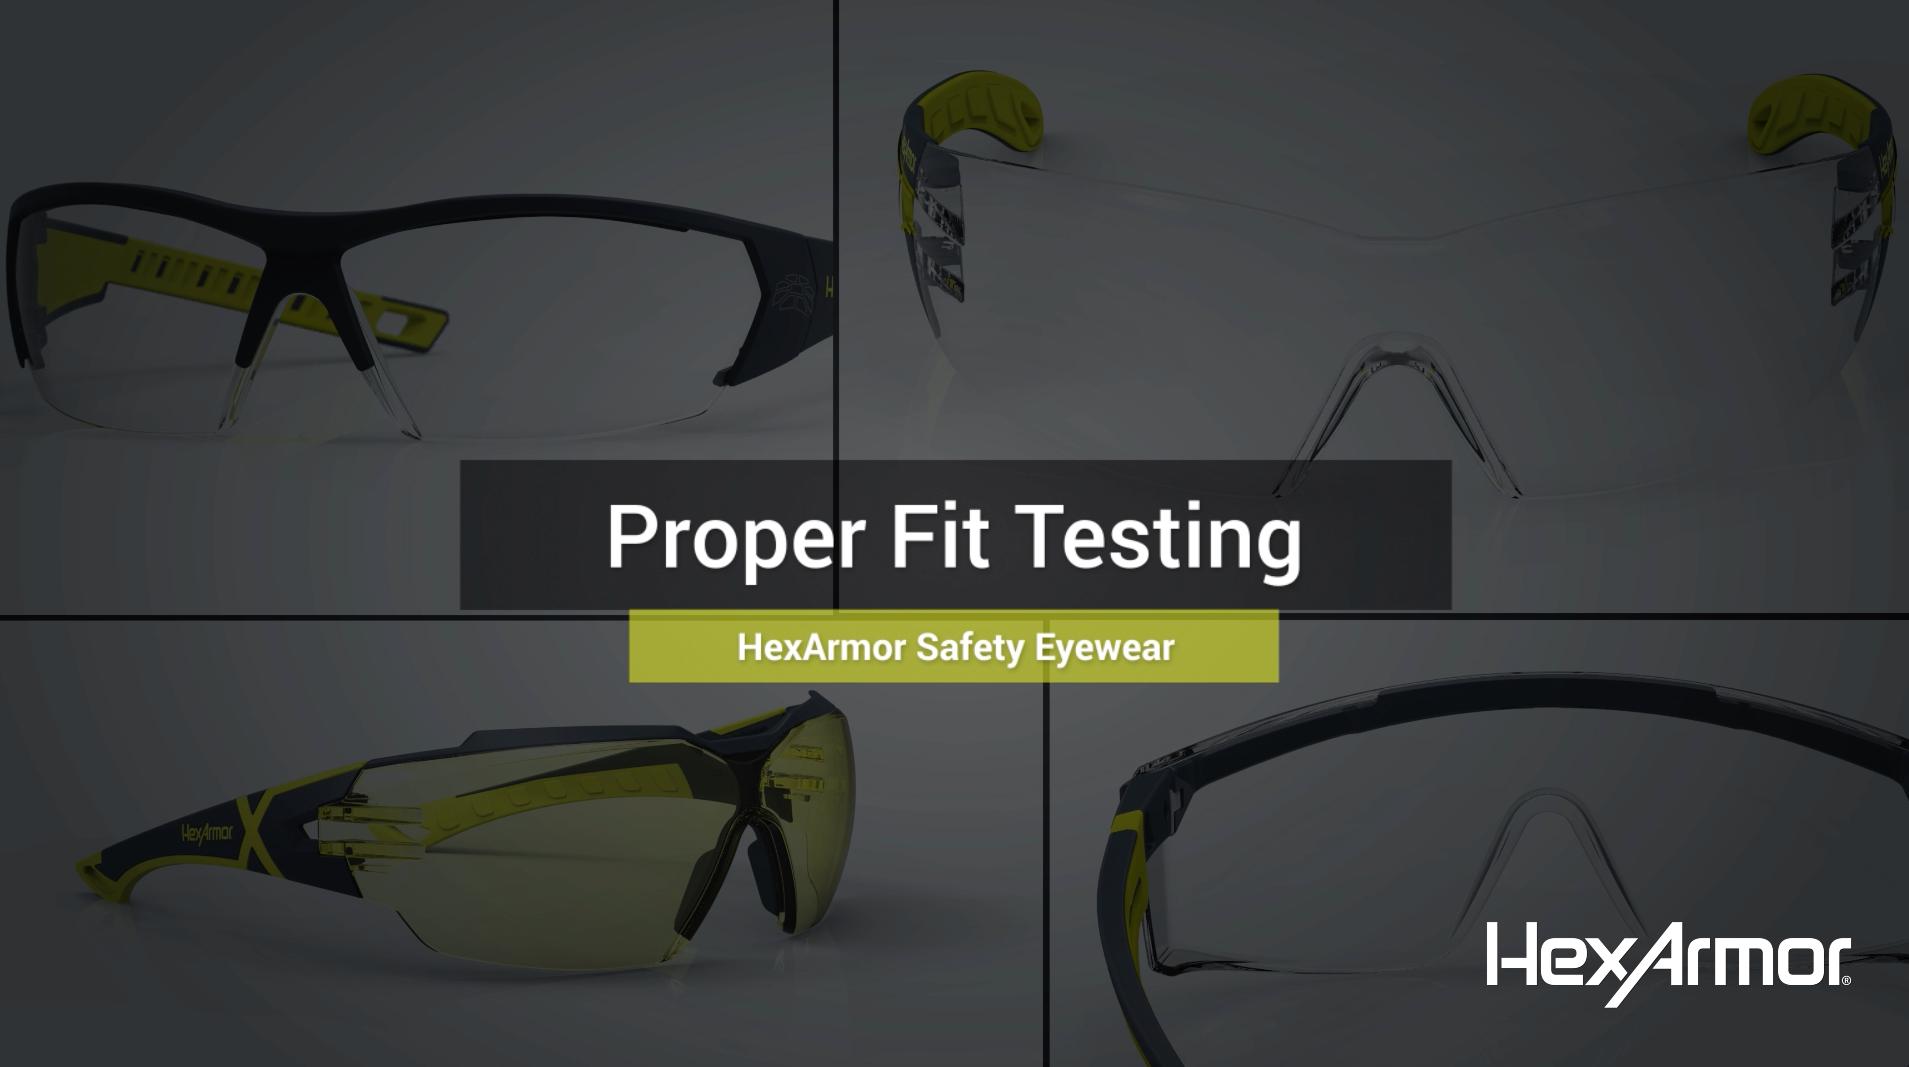 Proper Fitting —HexArmor Safety Eyewear